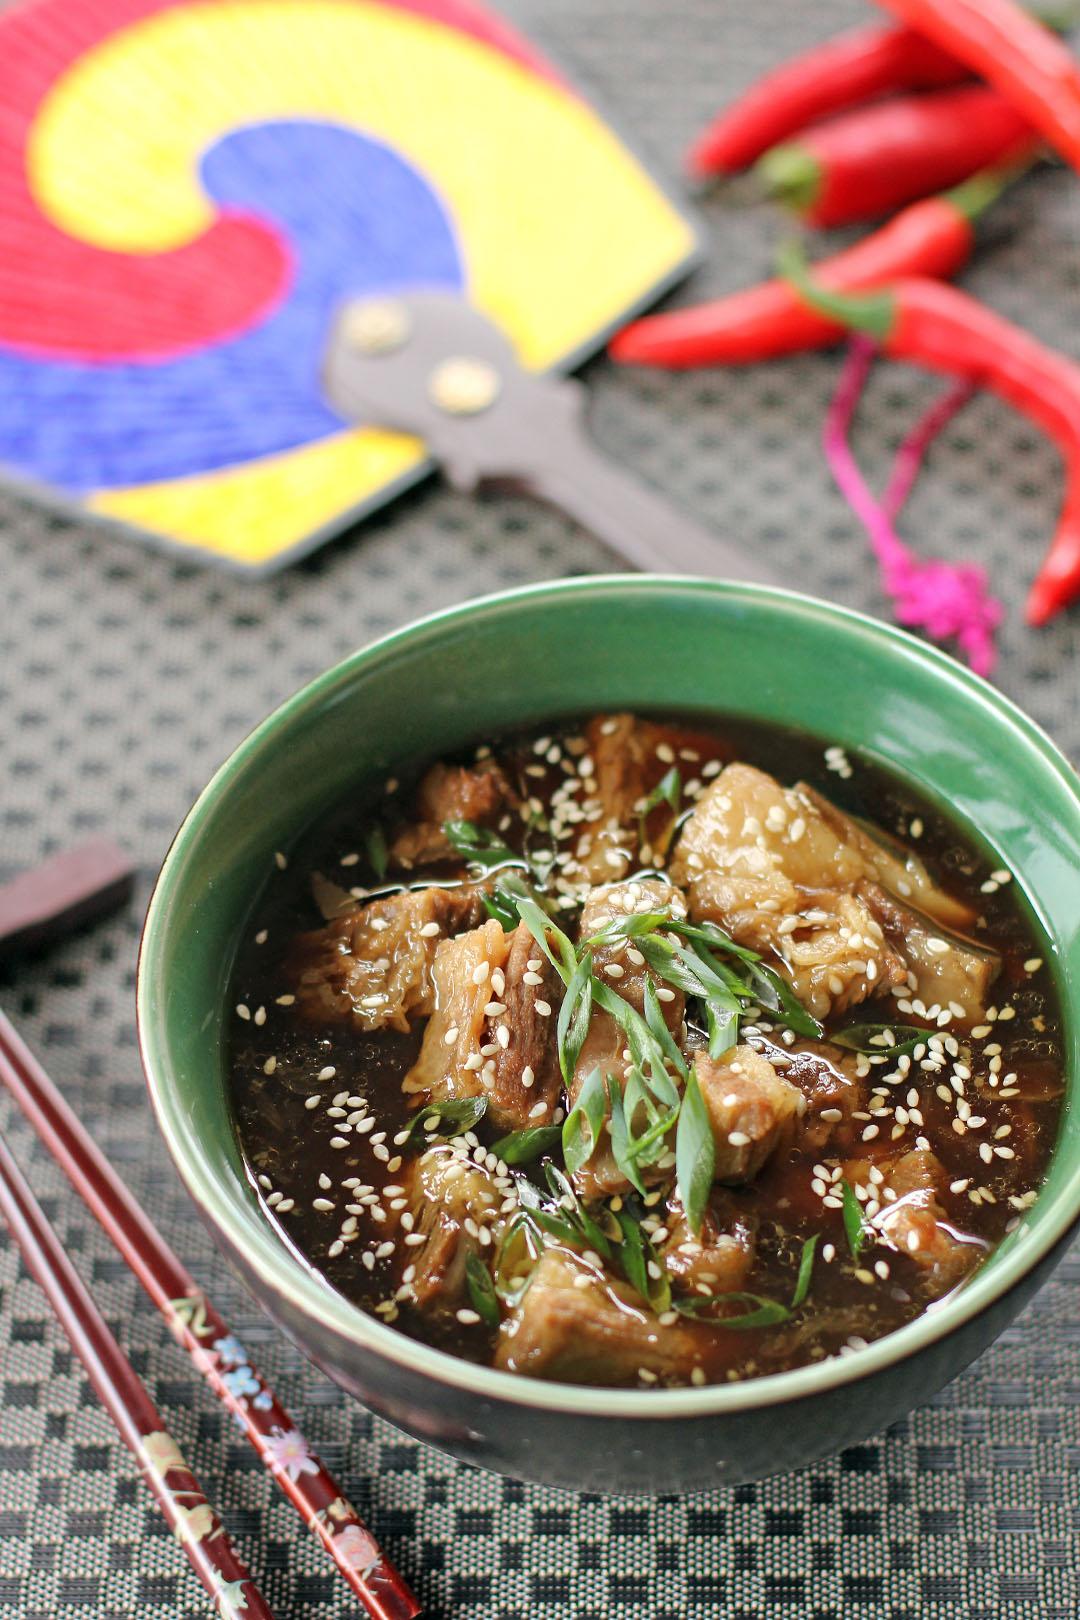 Korean Beef Stew Ang Sarap